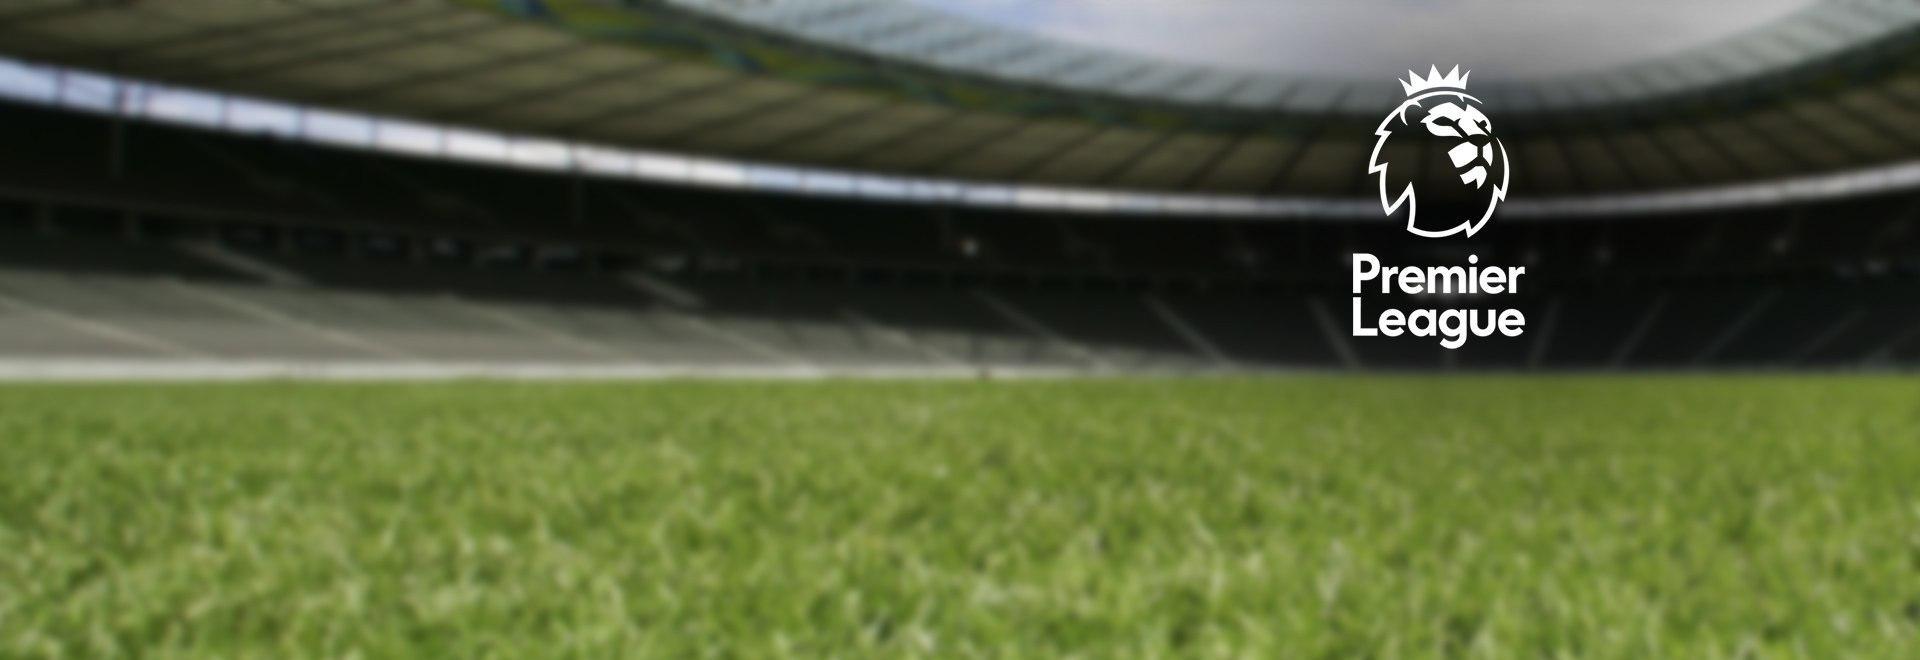 Liverpool - Everton. 25a g.